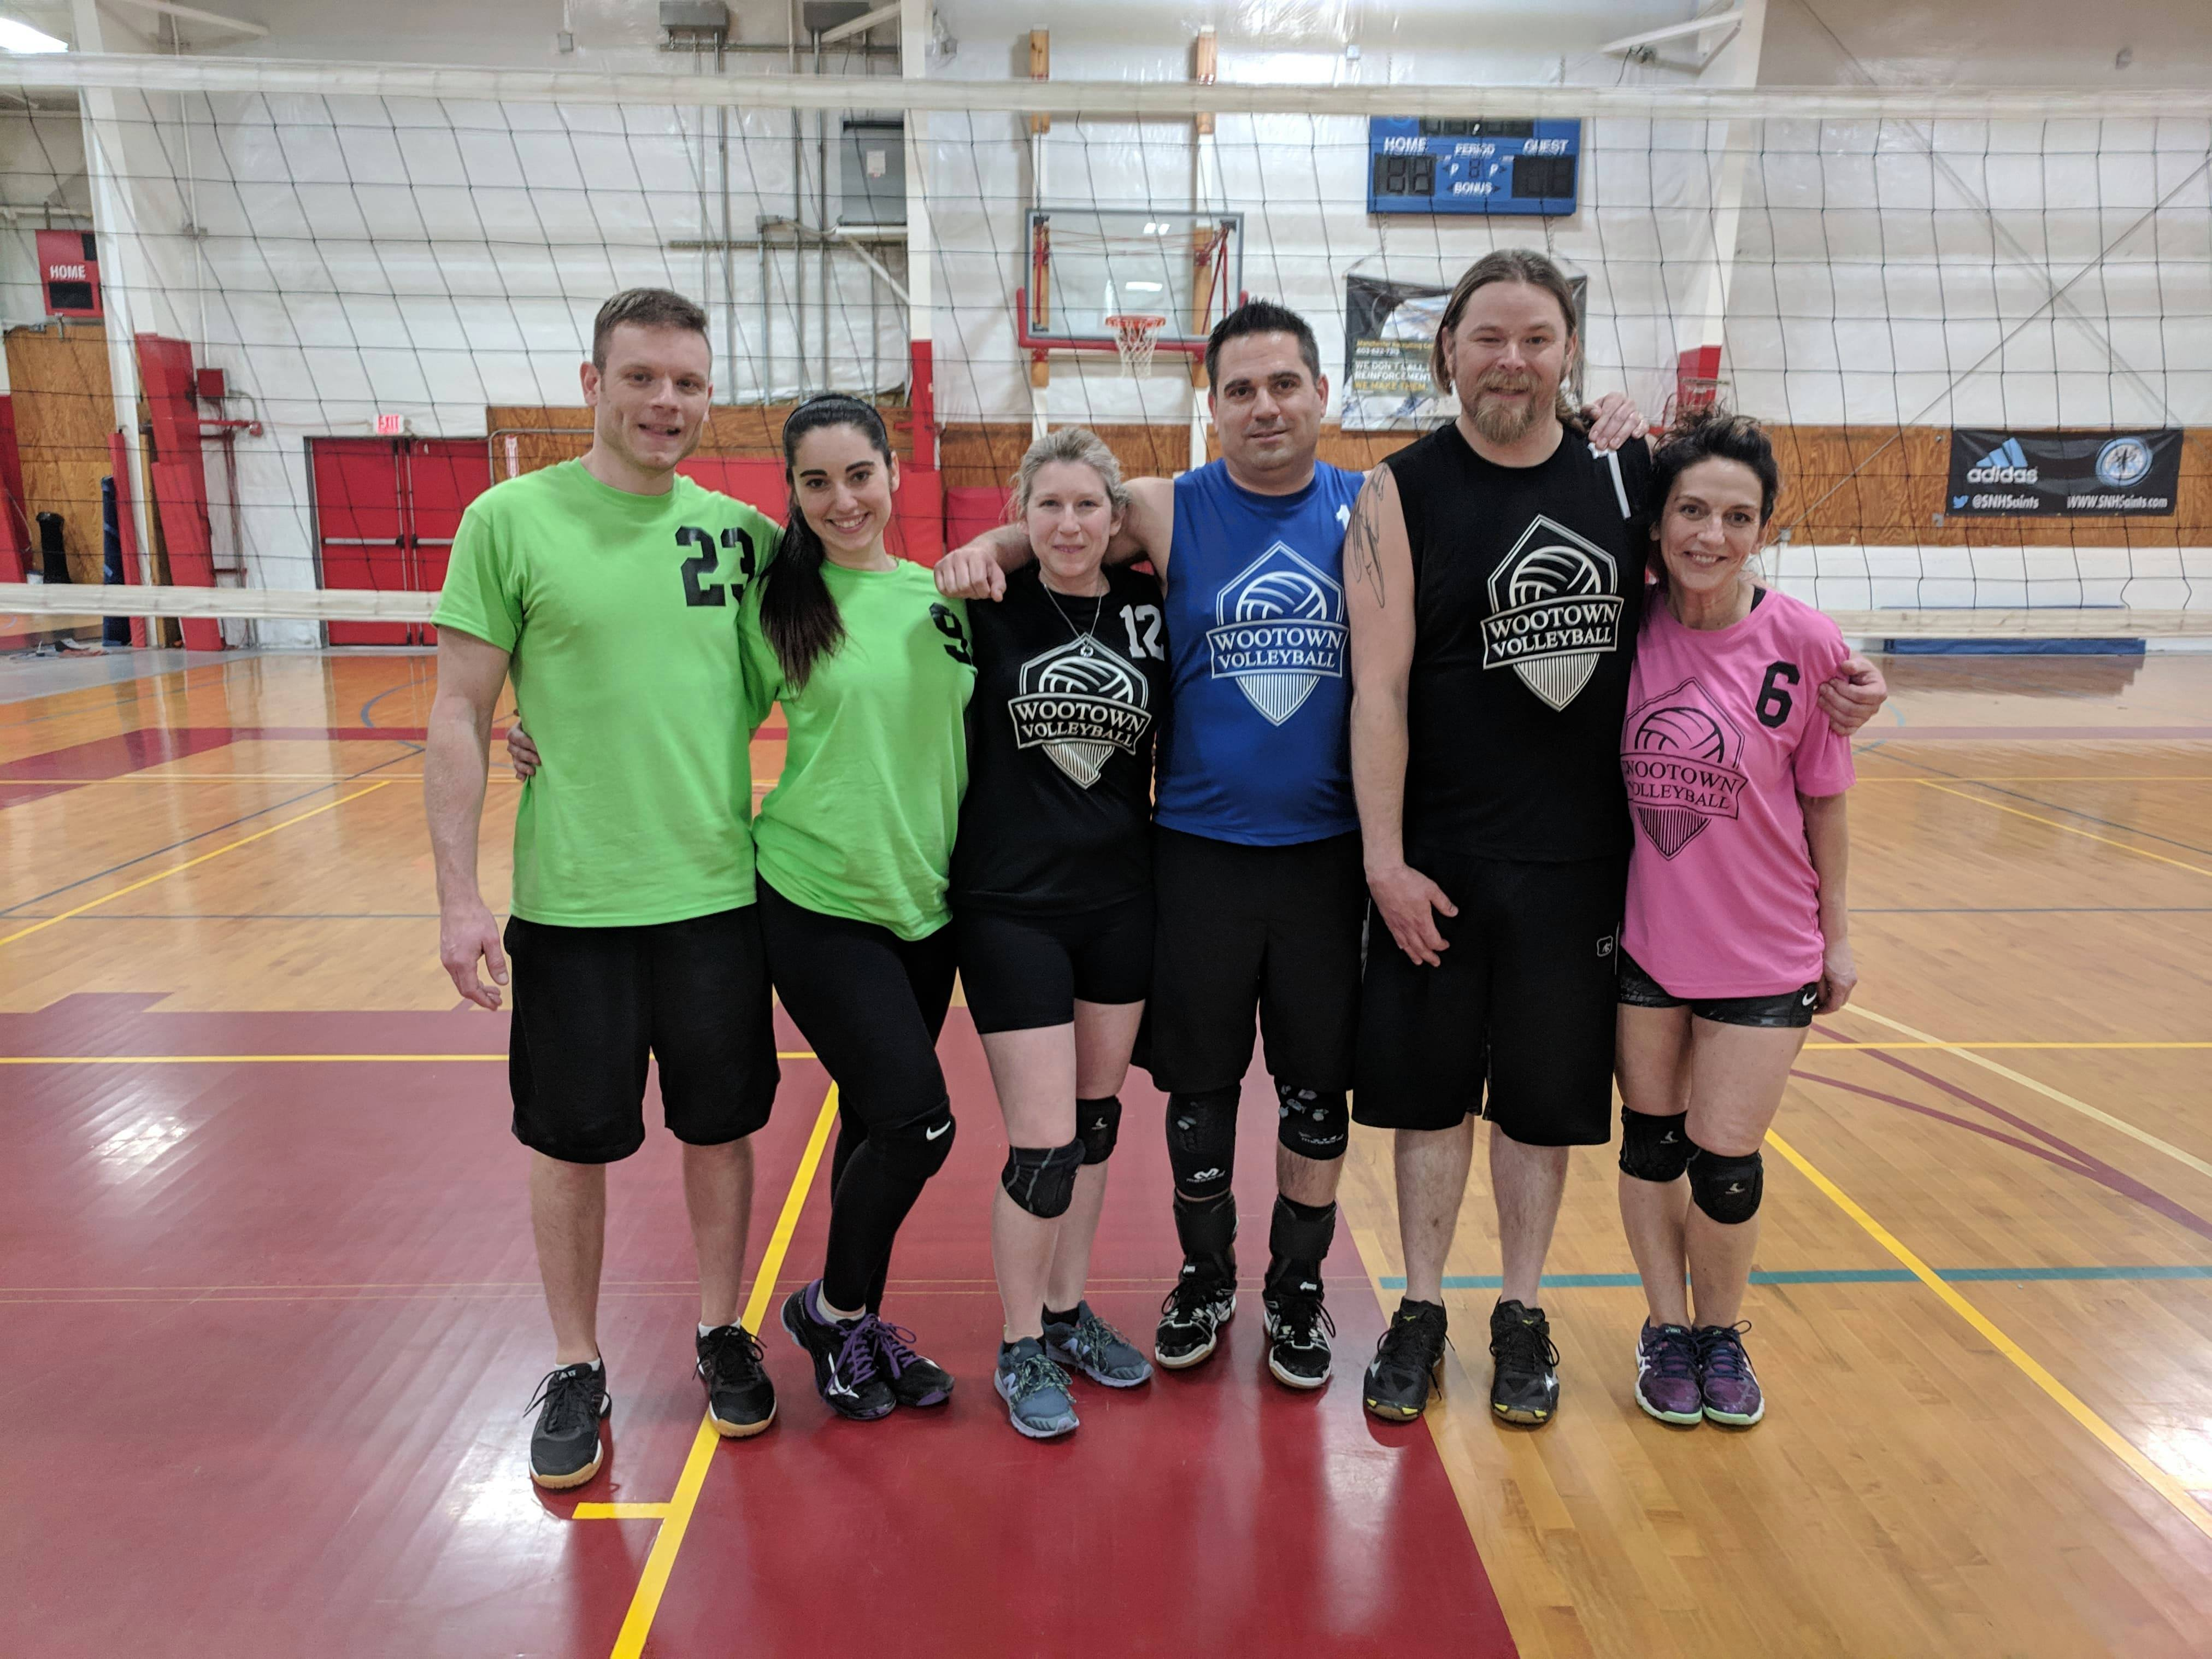 Volley Crew - 03/17/2019